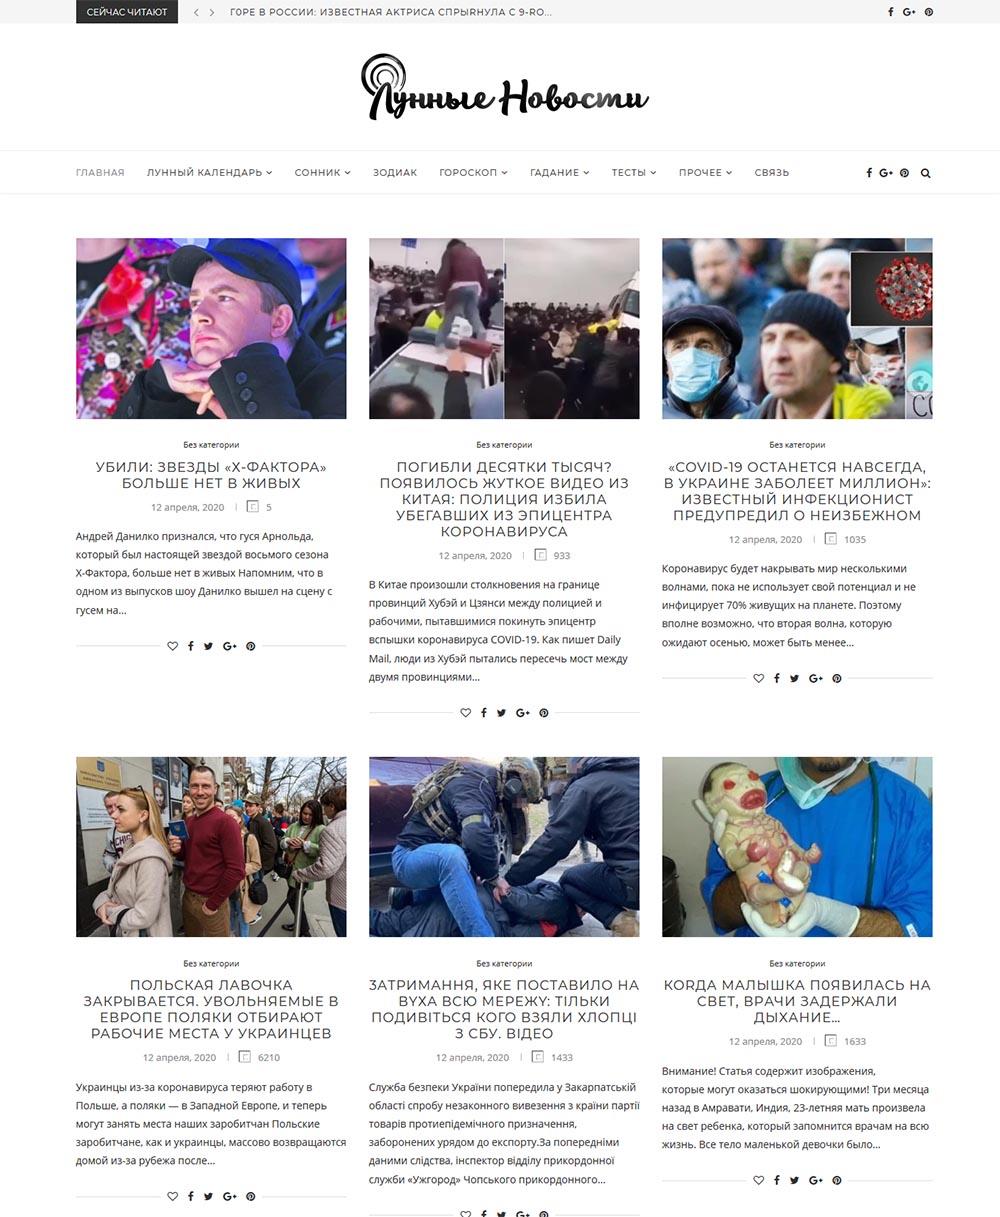 Лунные новости - фейкові сайти України